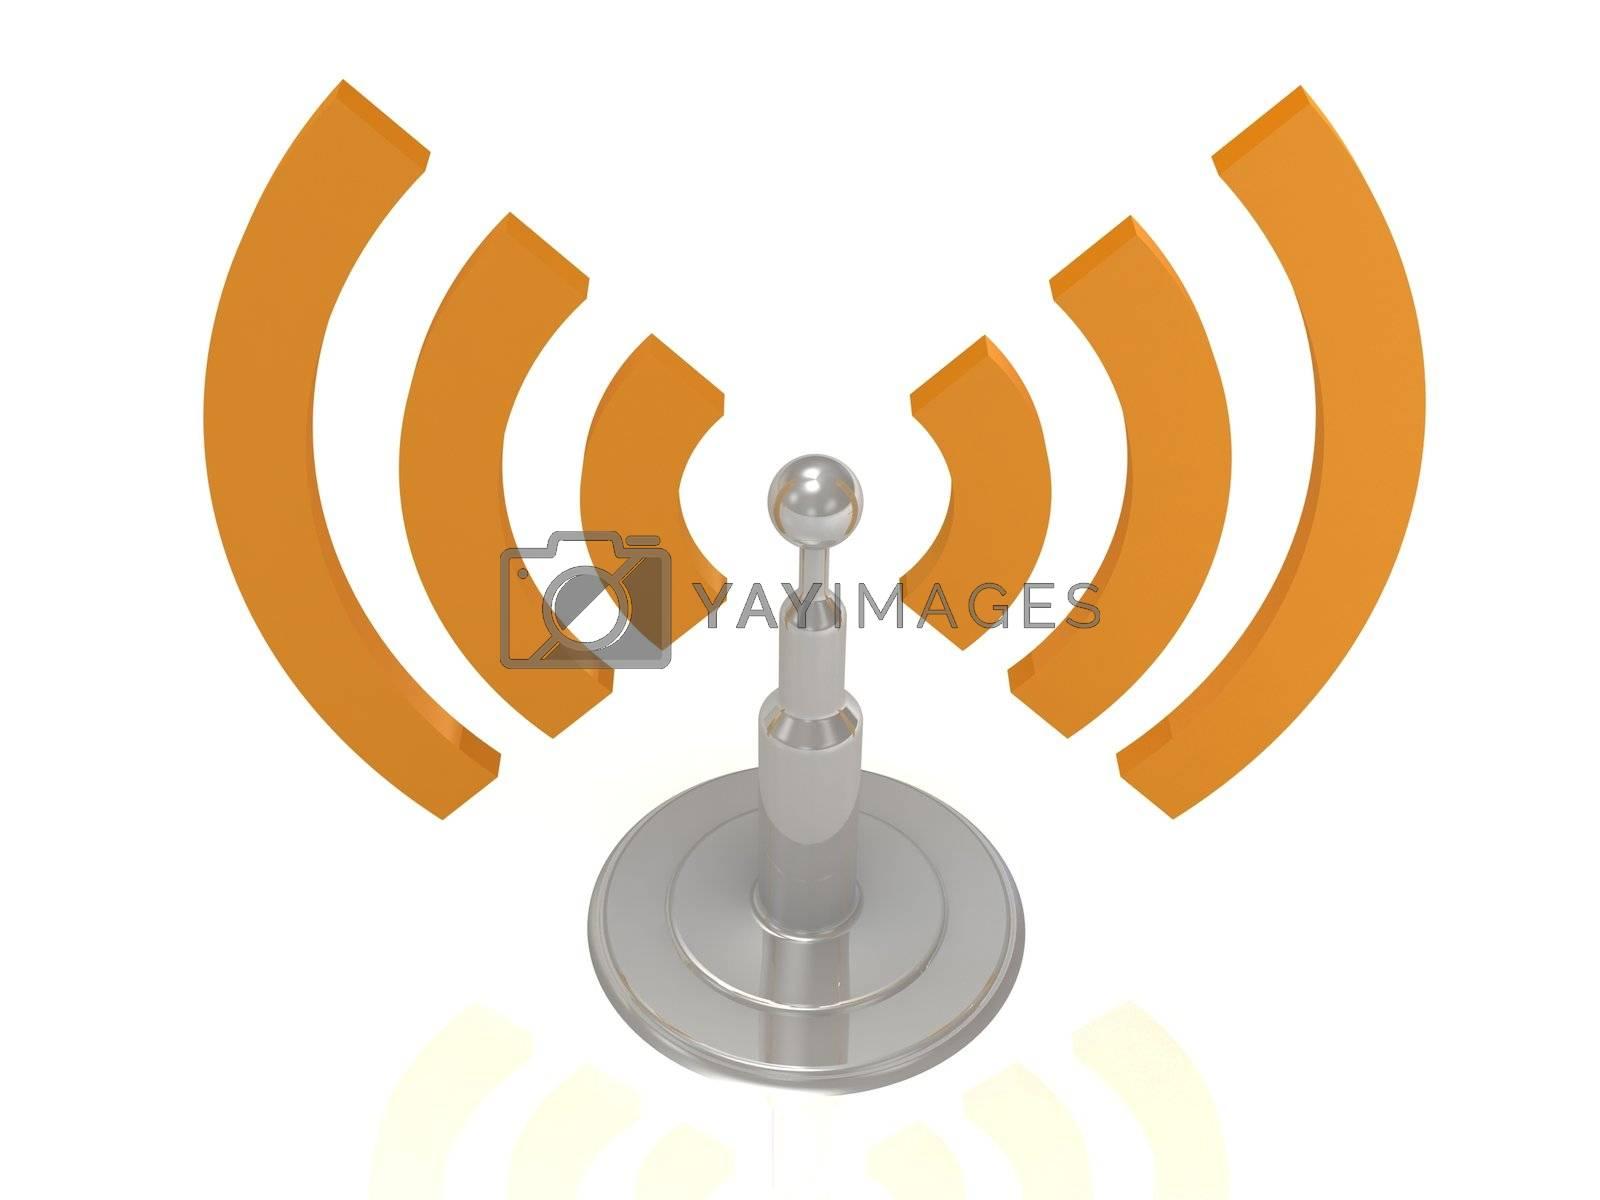 Silver antenna radiation orange waves on white background, 3D render image